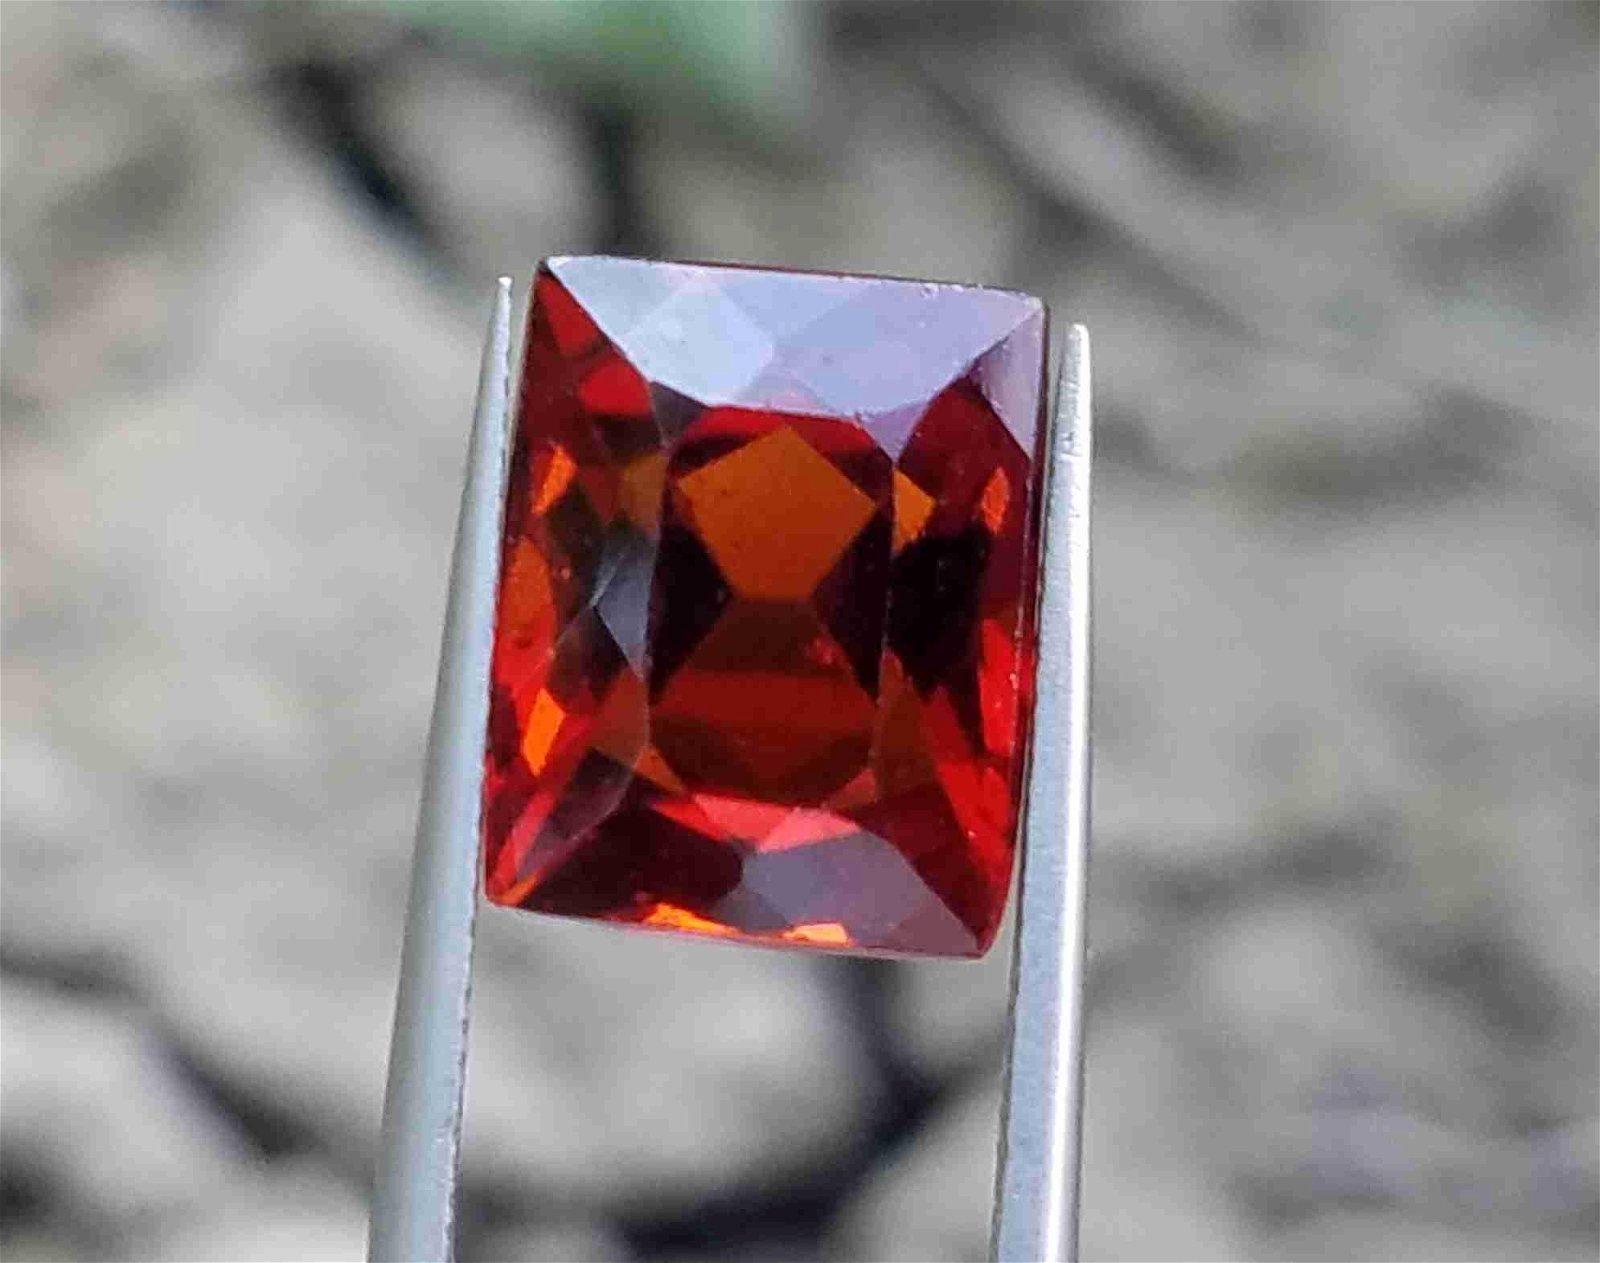 6.4 Carats Beautiful Hessonite Garnet ~ 11x9x7 MM